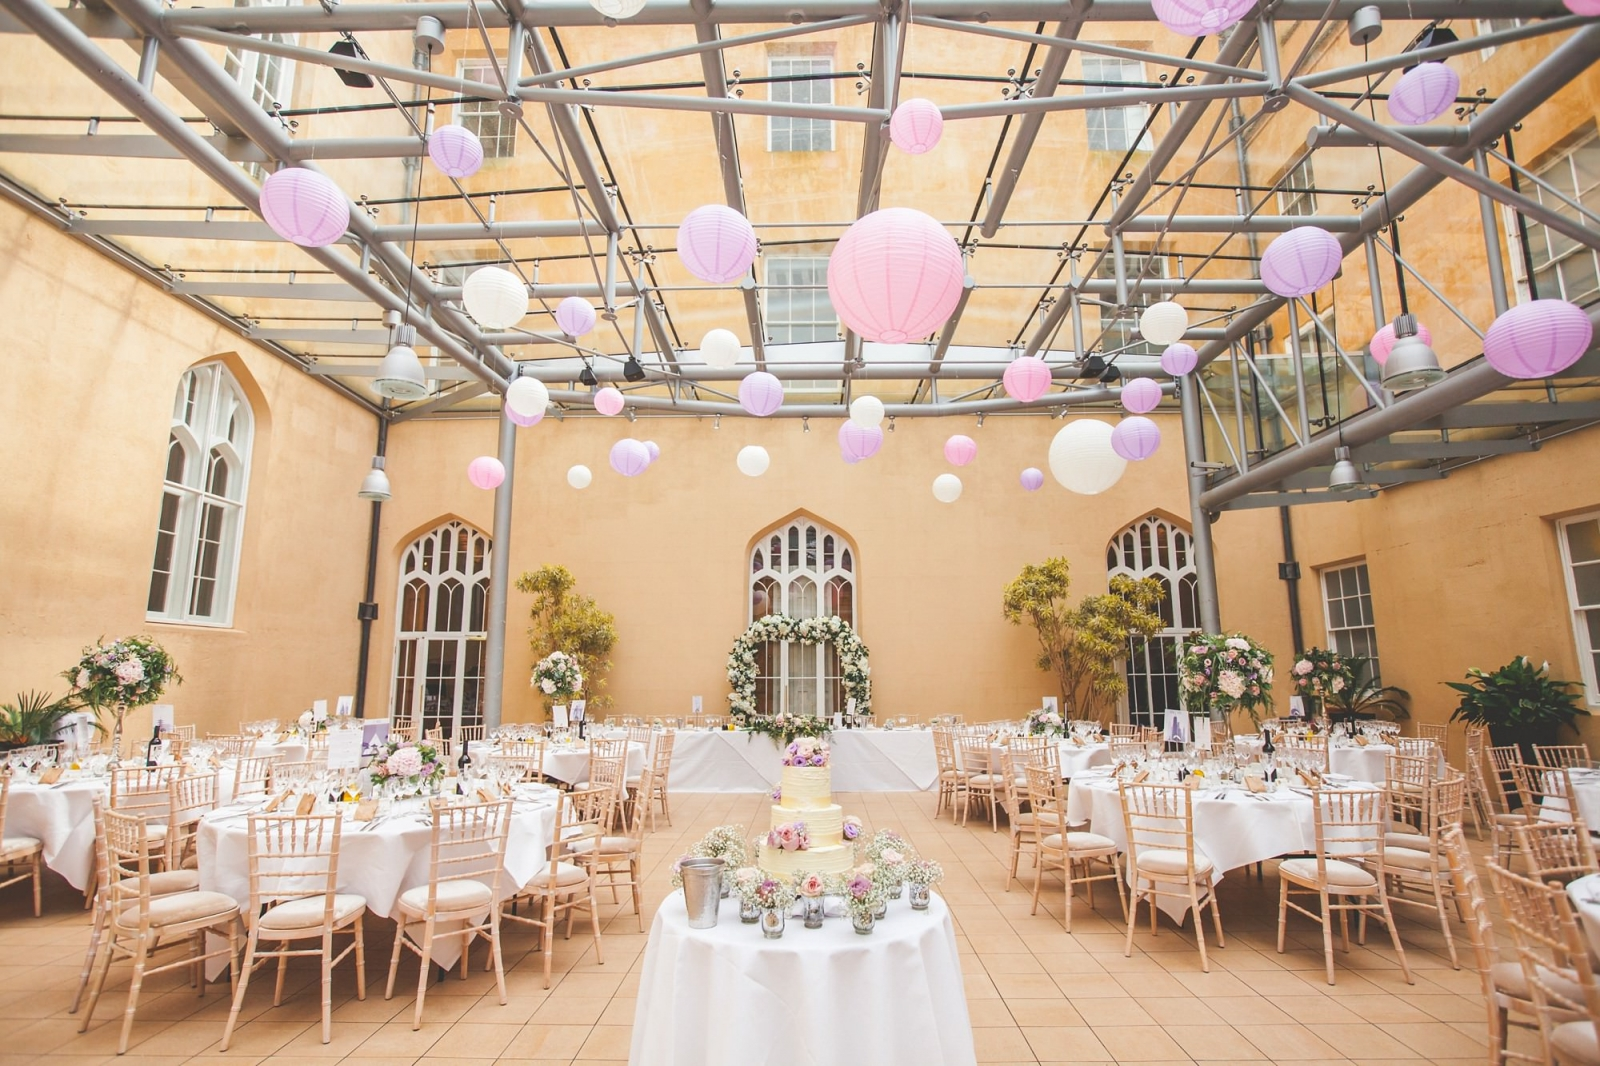 Ditton Manor Wedding Day